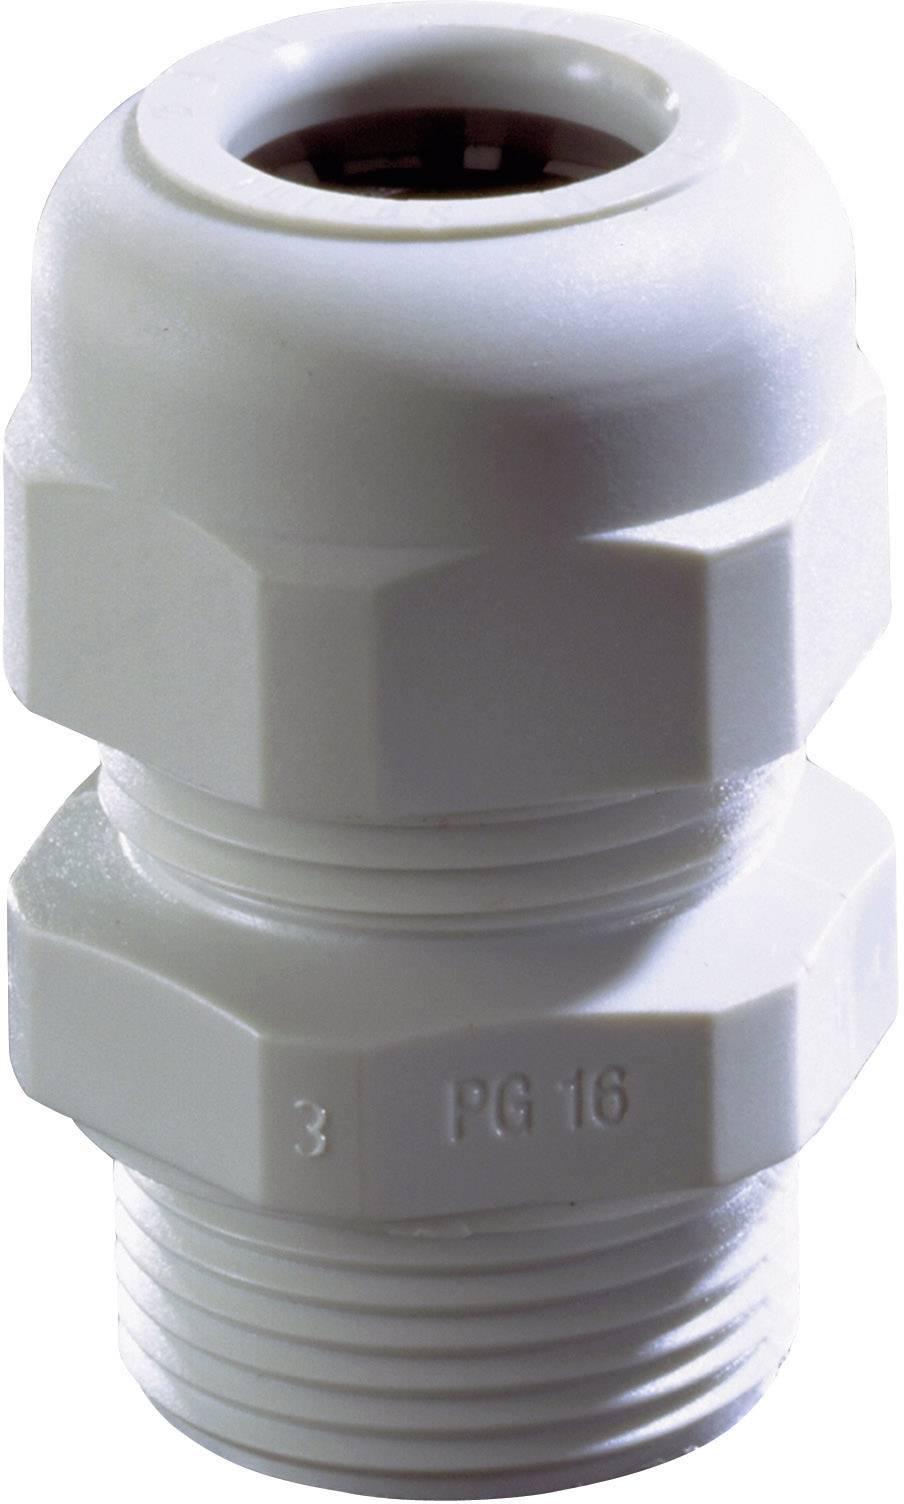 Kabelová průchodka Wiska SKV PG 9 RAL 9005 (10066192), PG9, černá